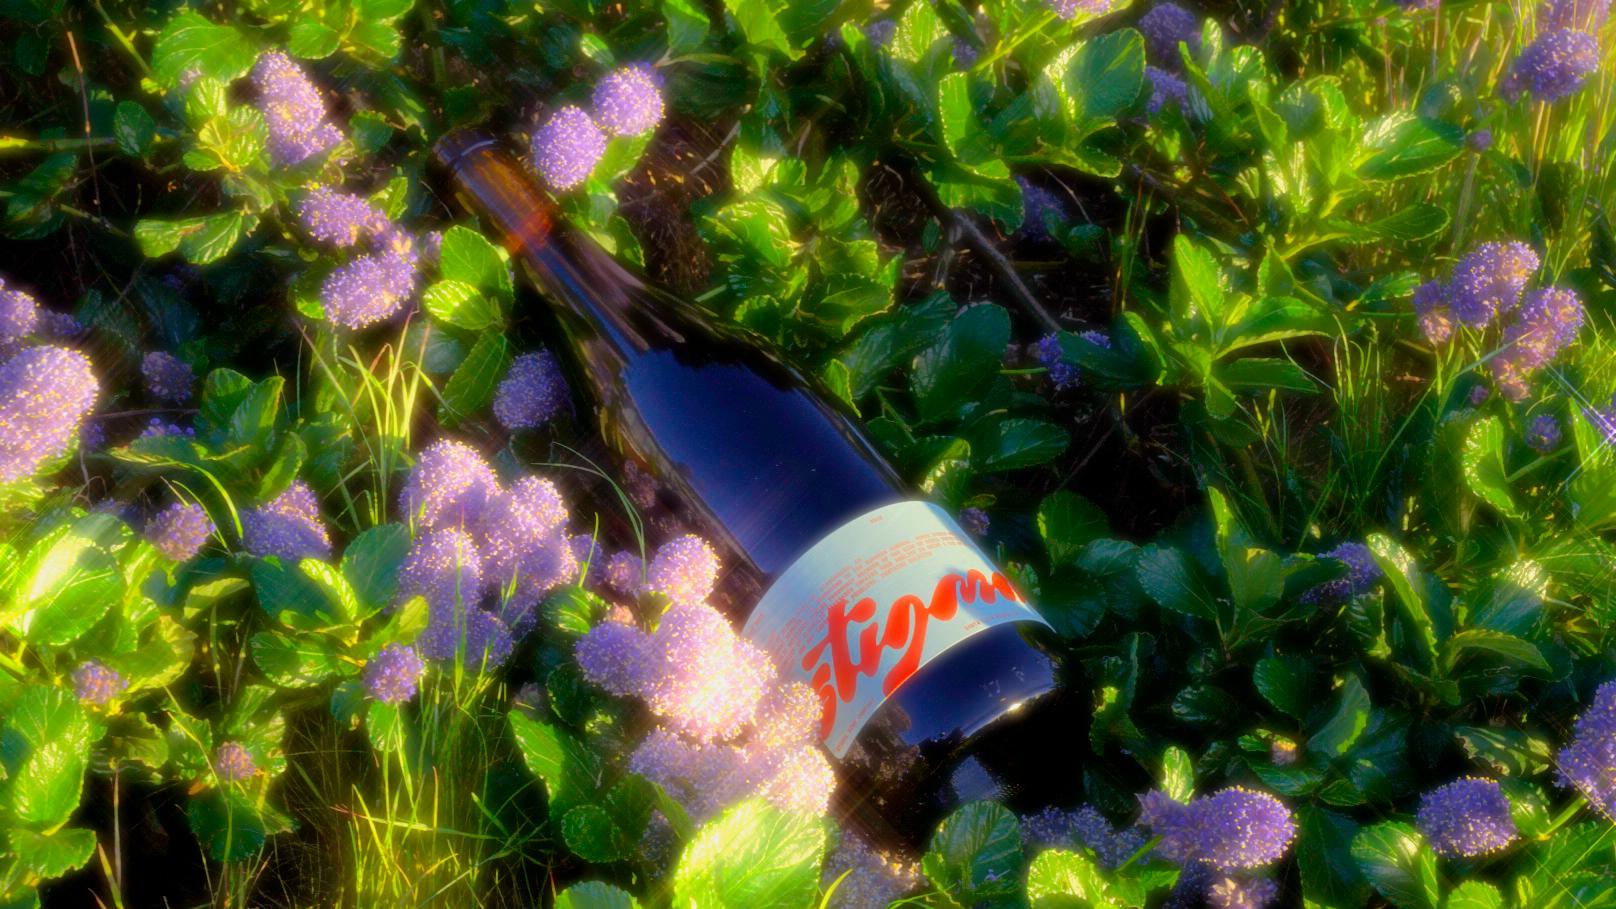 STIGMA_Bottle01-1